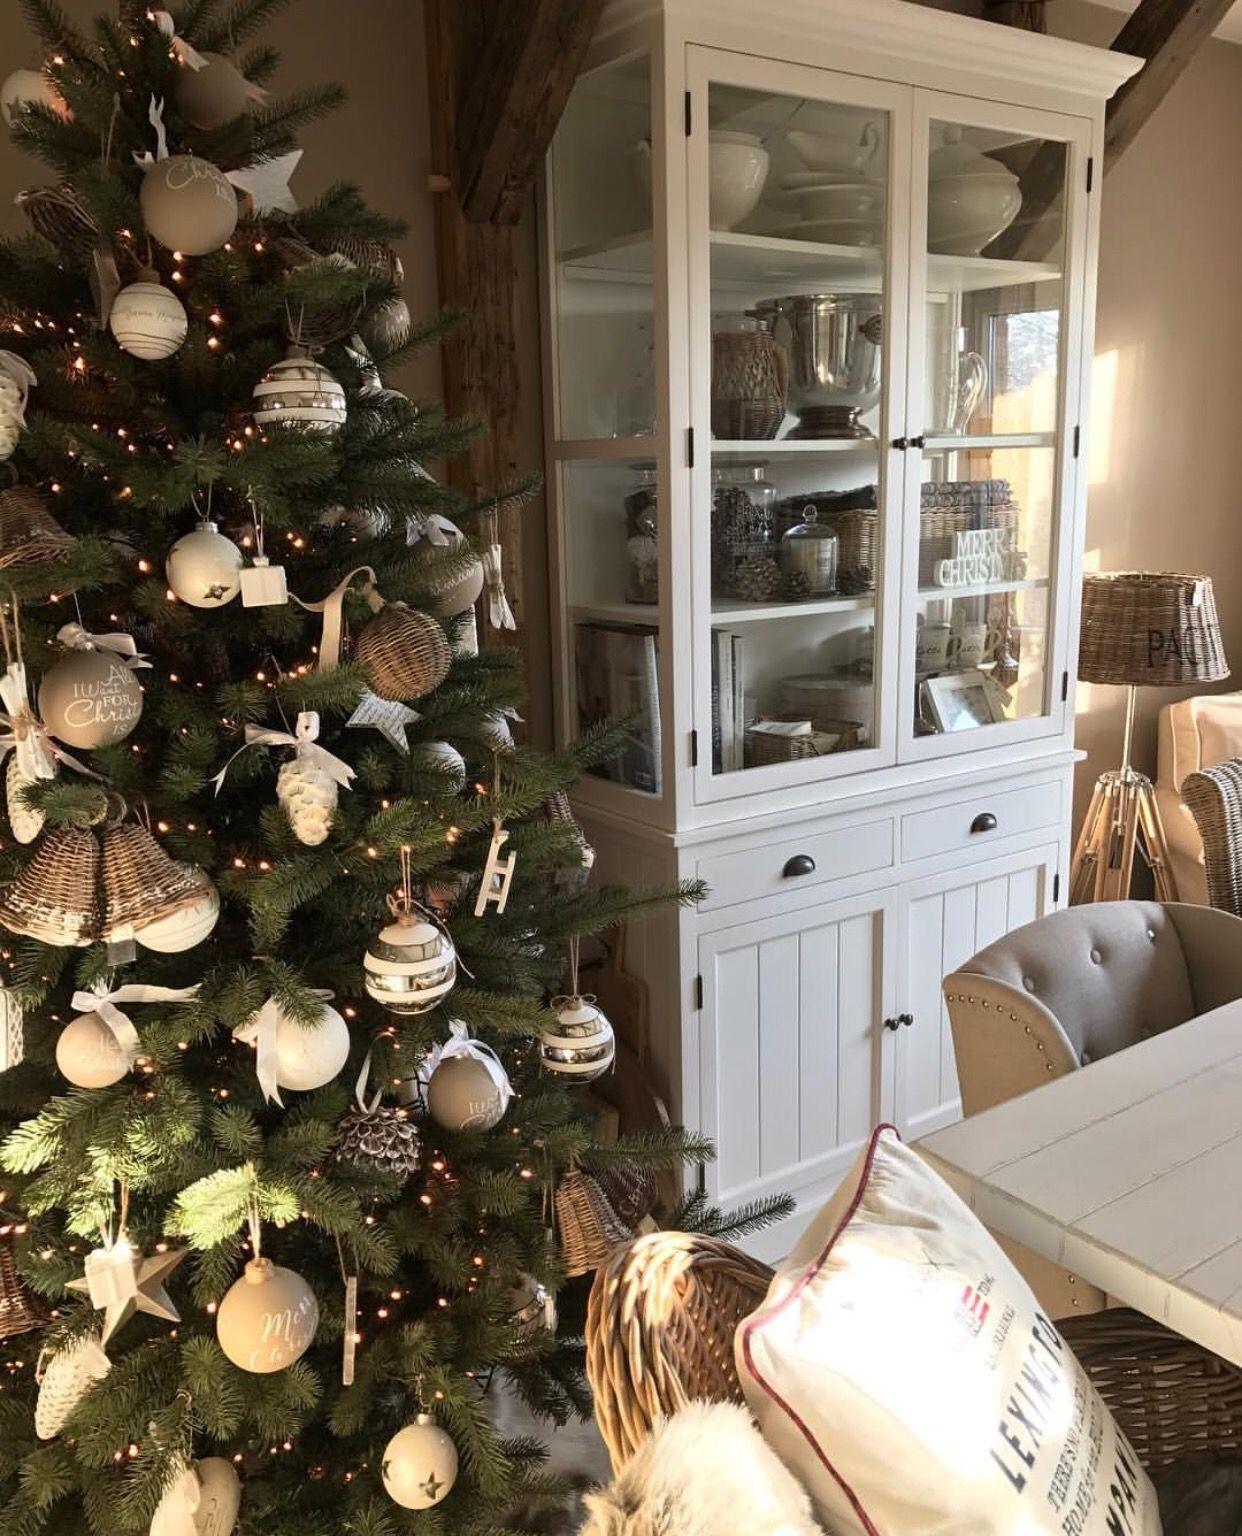 Wonderbaar RIVIERA MAISON Christmas Decorations   C H R I S T M A S - Kerst KW-39